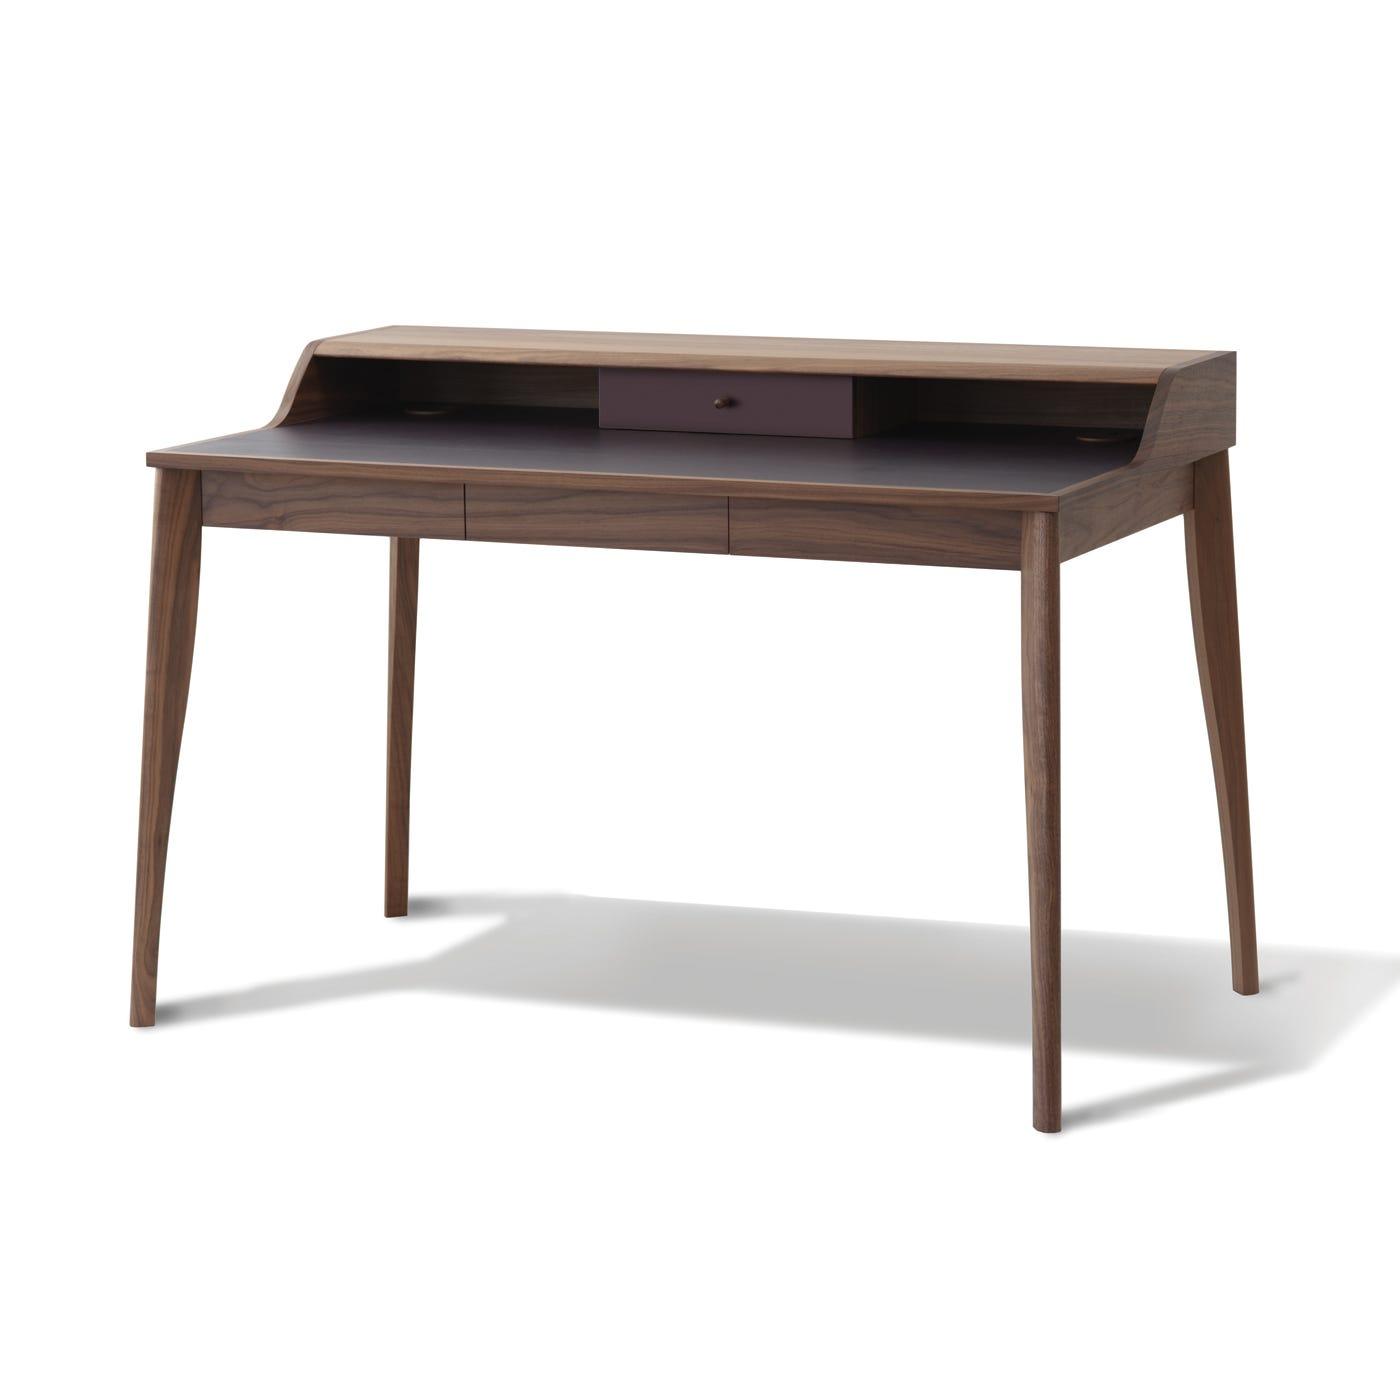 Yves Desk Walnut & Aubergine Leather